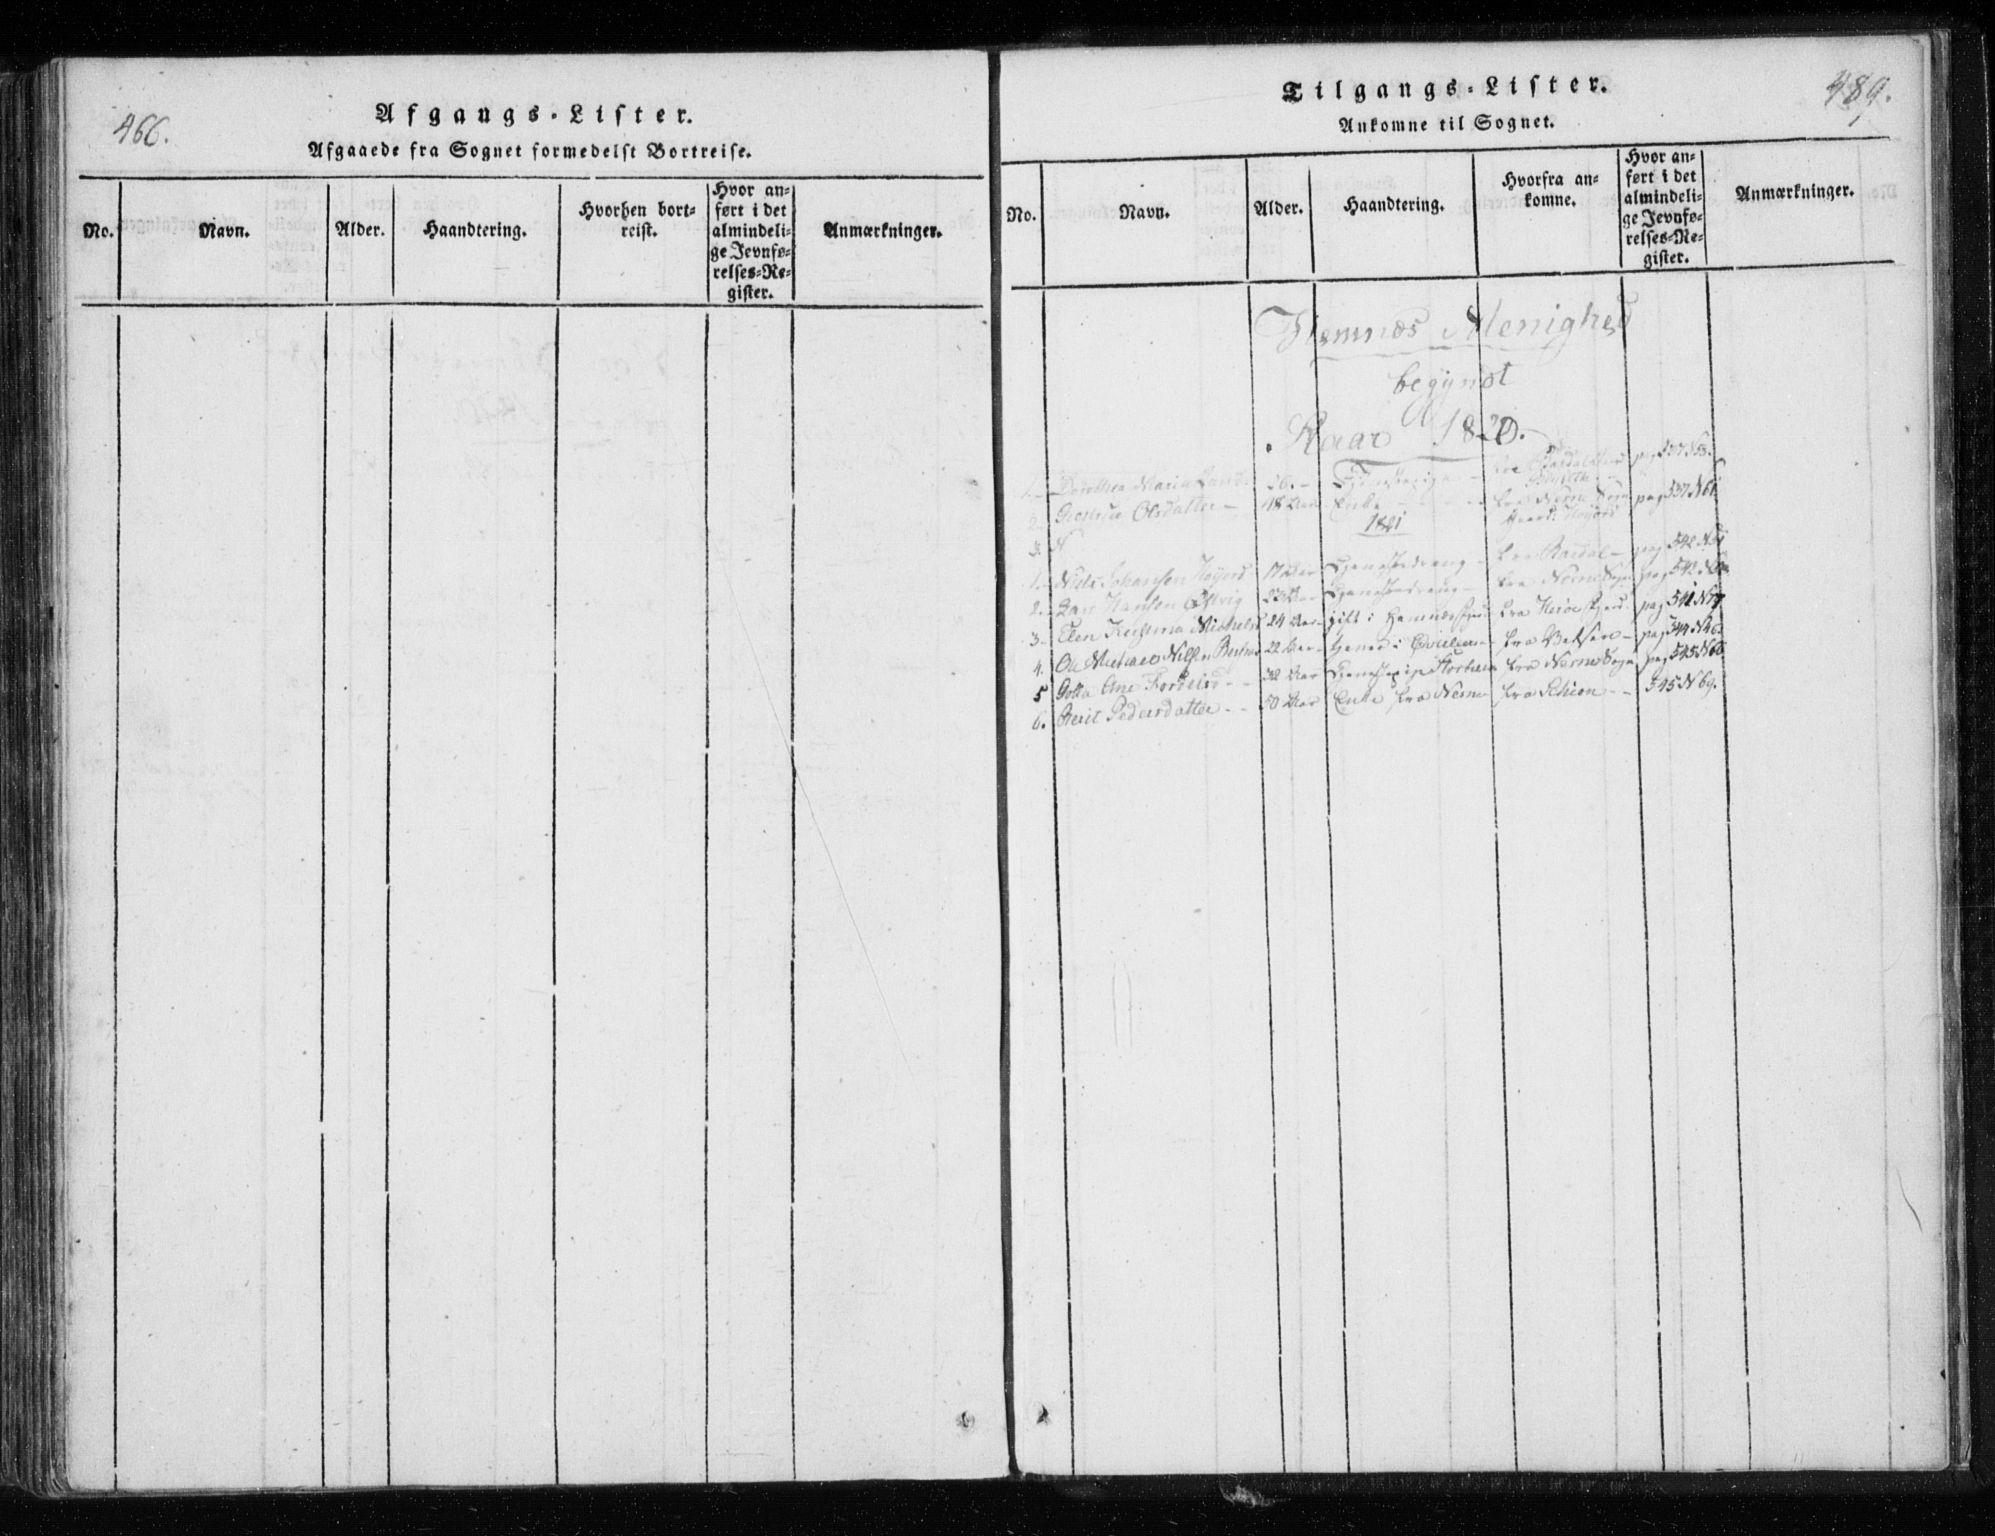 SAT, Ministerialprotokoller, klokkerbøker og fødselsregistre - Nordland, 825/L0353: Ministerialbok nr. 825A07, 1820-1826, s. 488-489